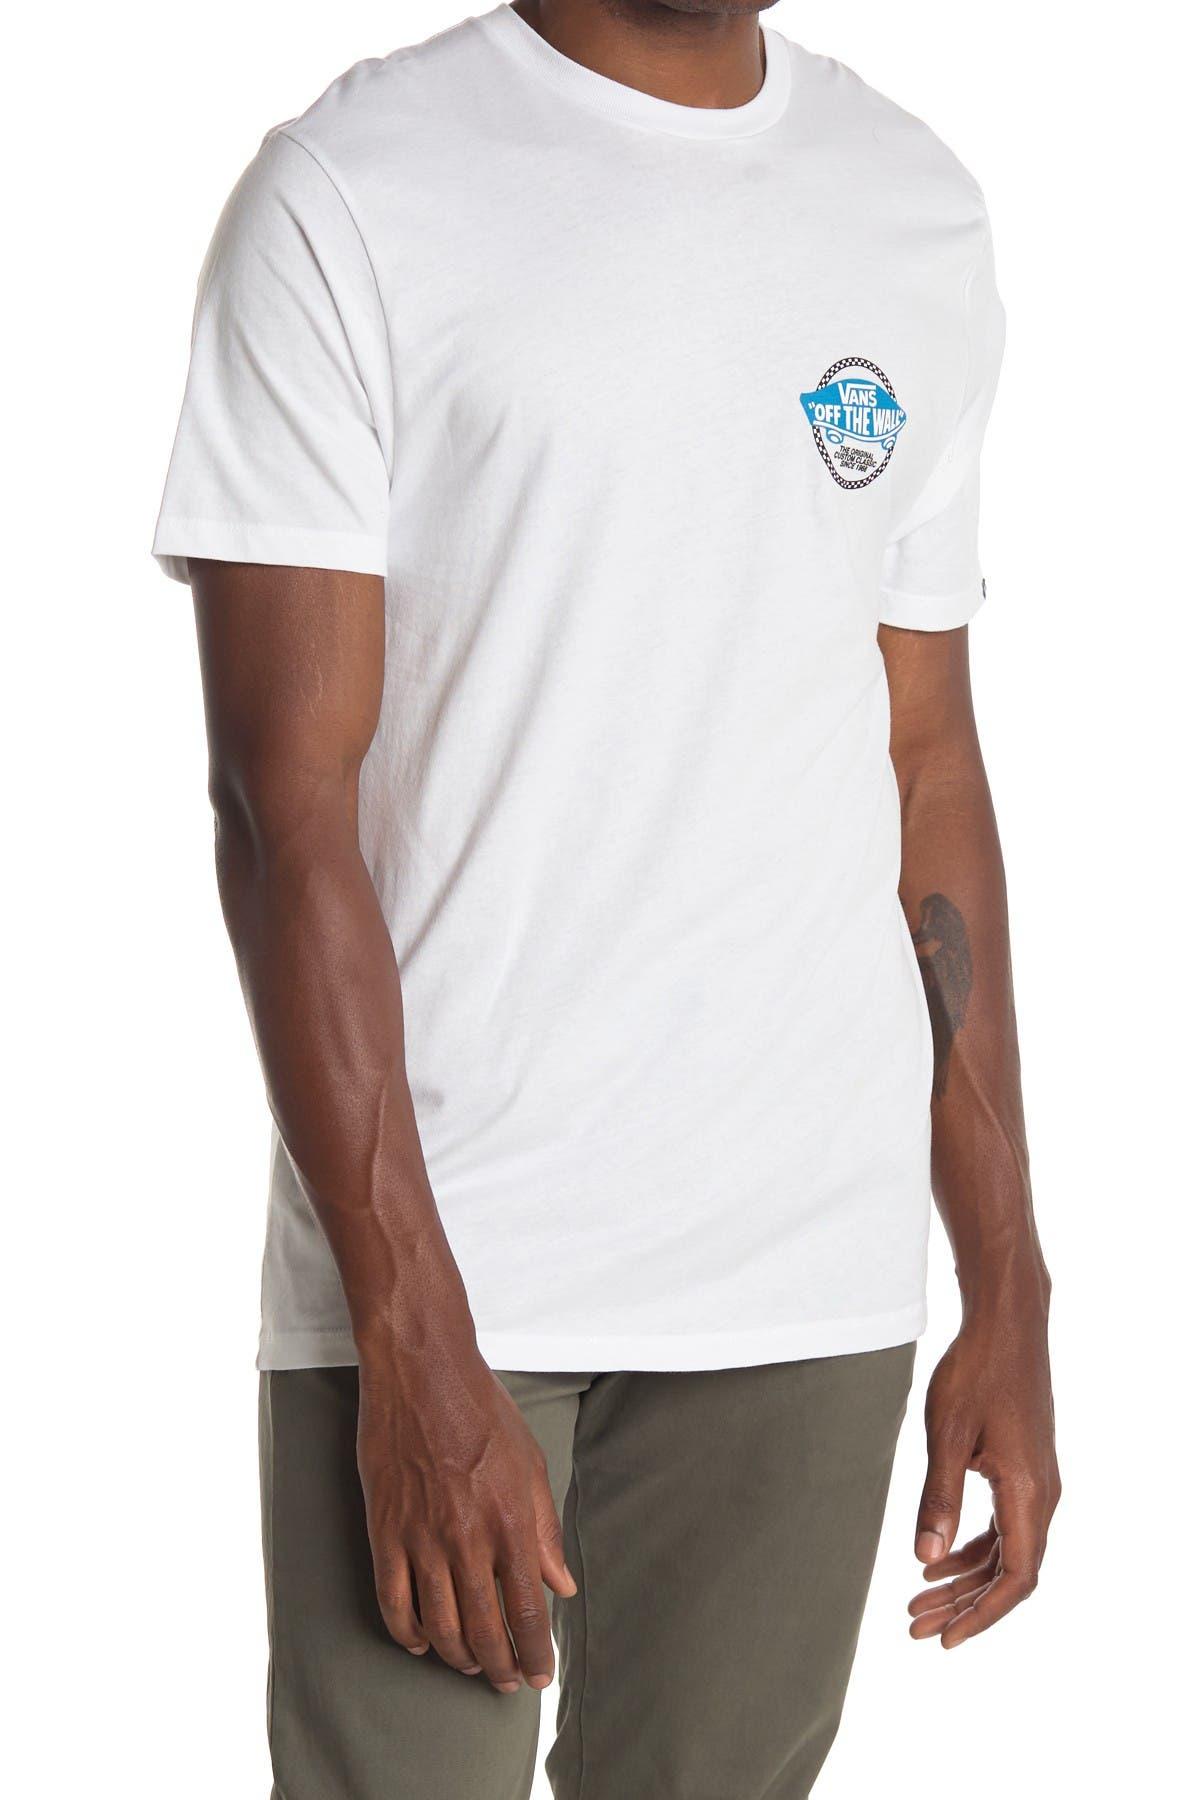 Image of VANS Checker Off The Wall Logo T-Shirt